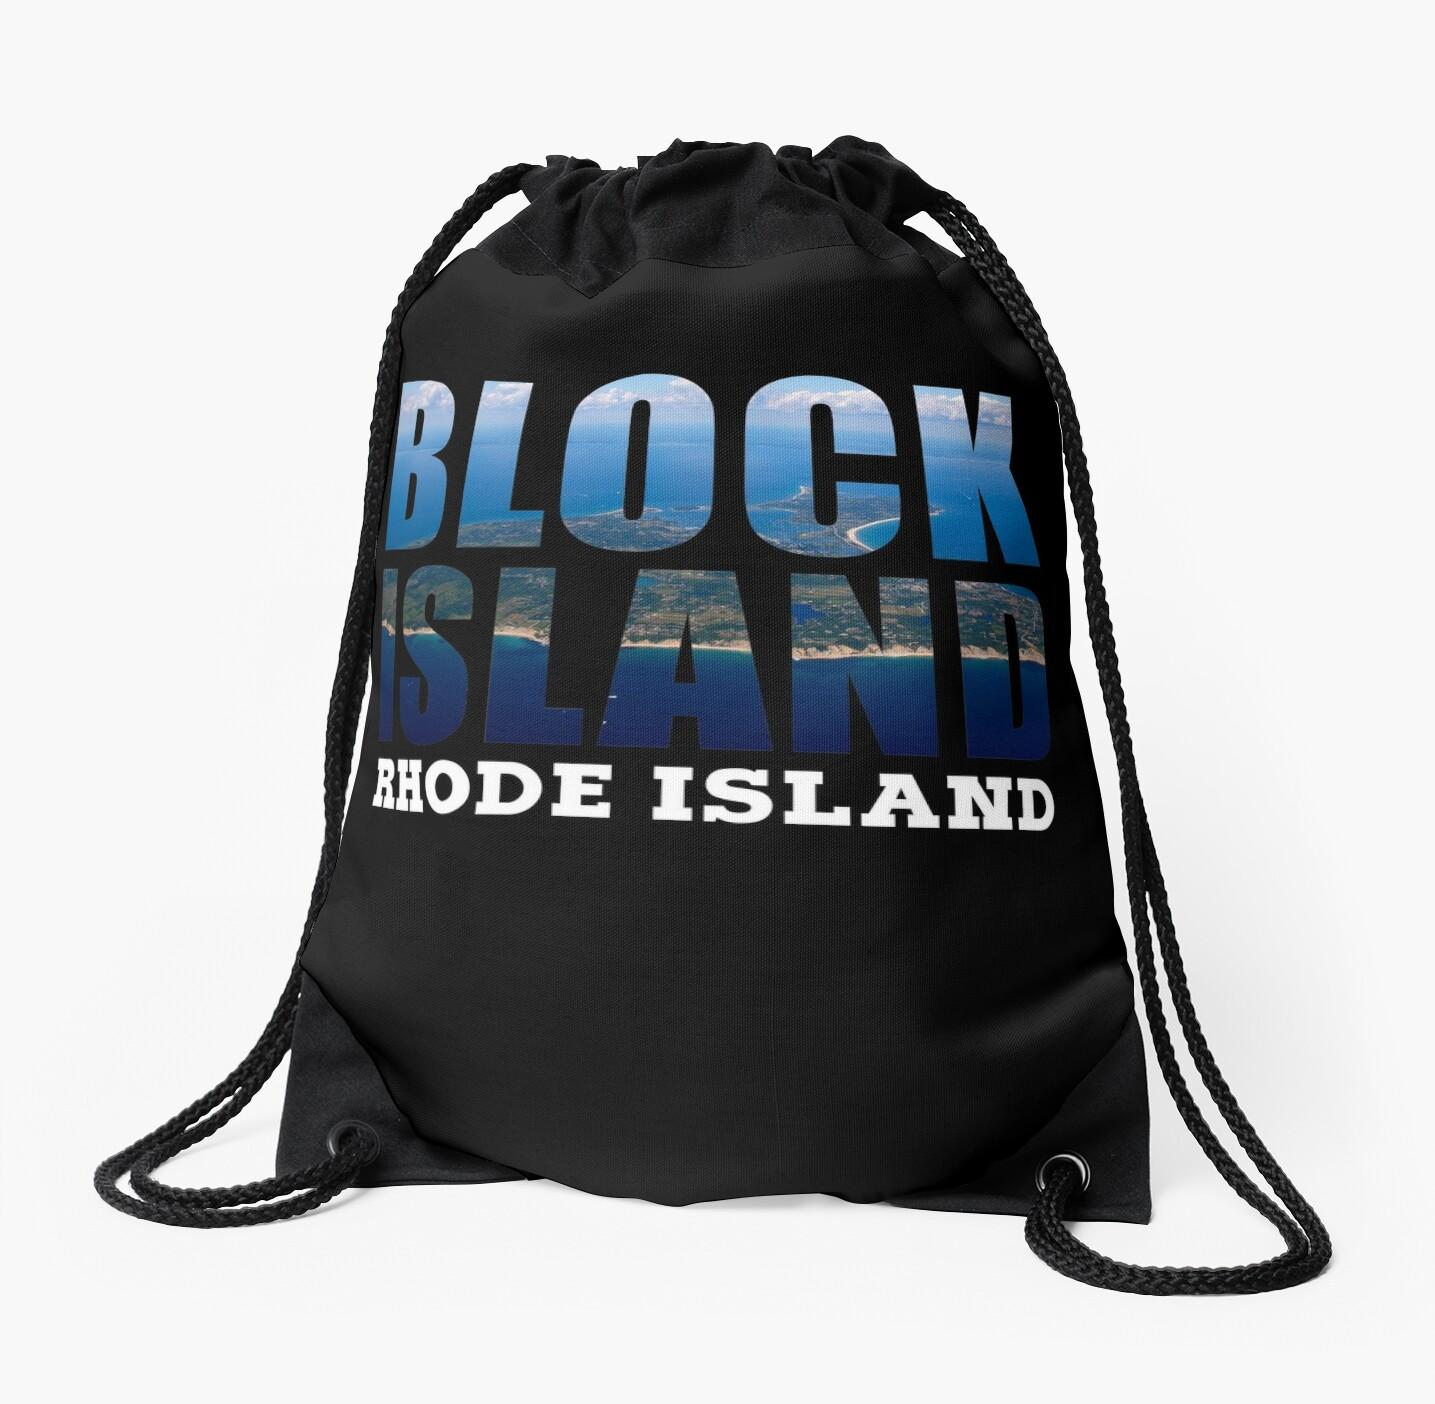 Block Island, Rhode Island Background by Rhode Island Hype